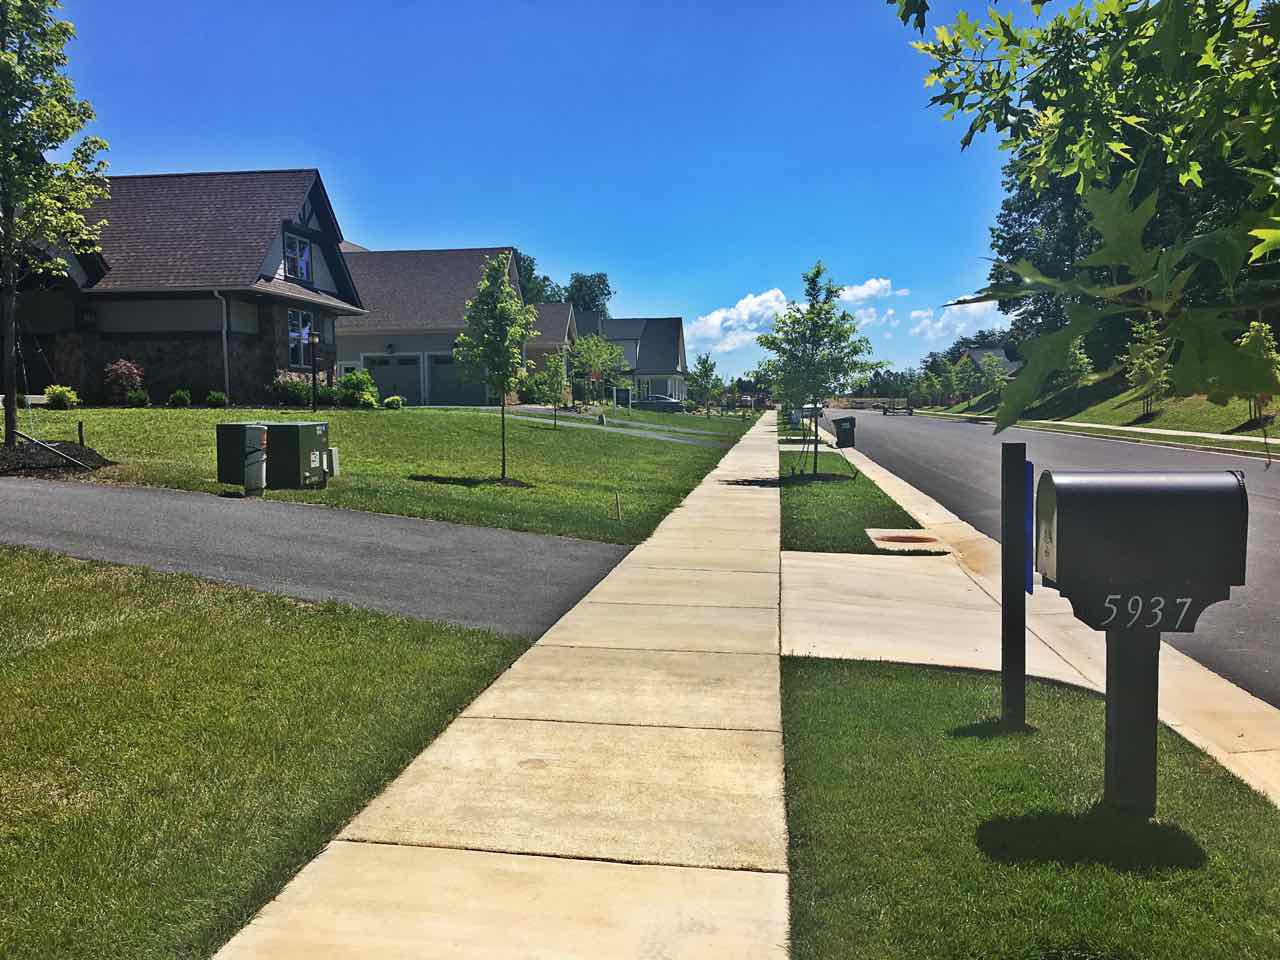 Sidewalk in Westlake Crozet VA